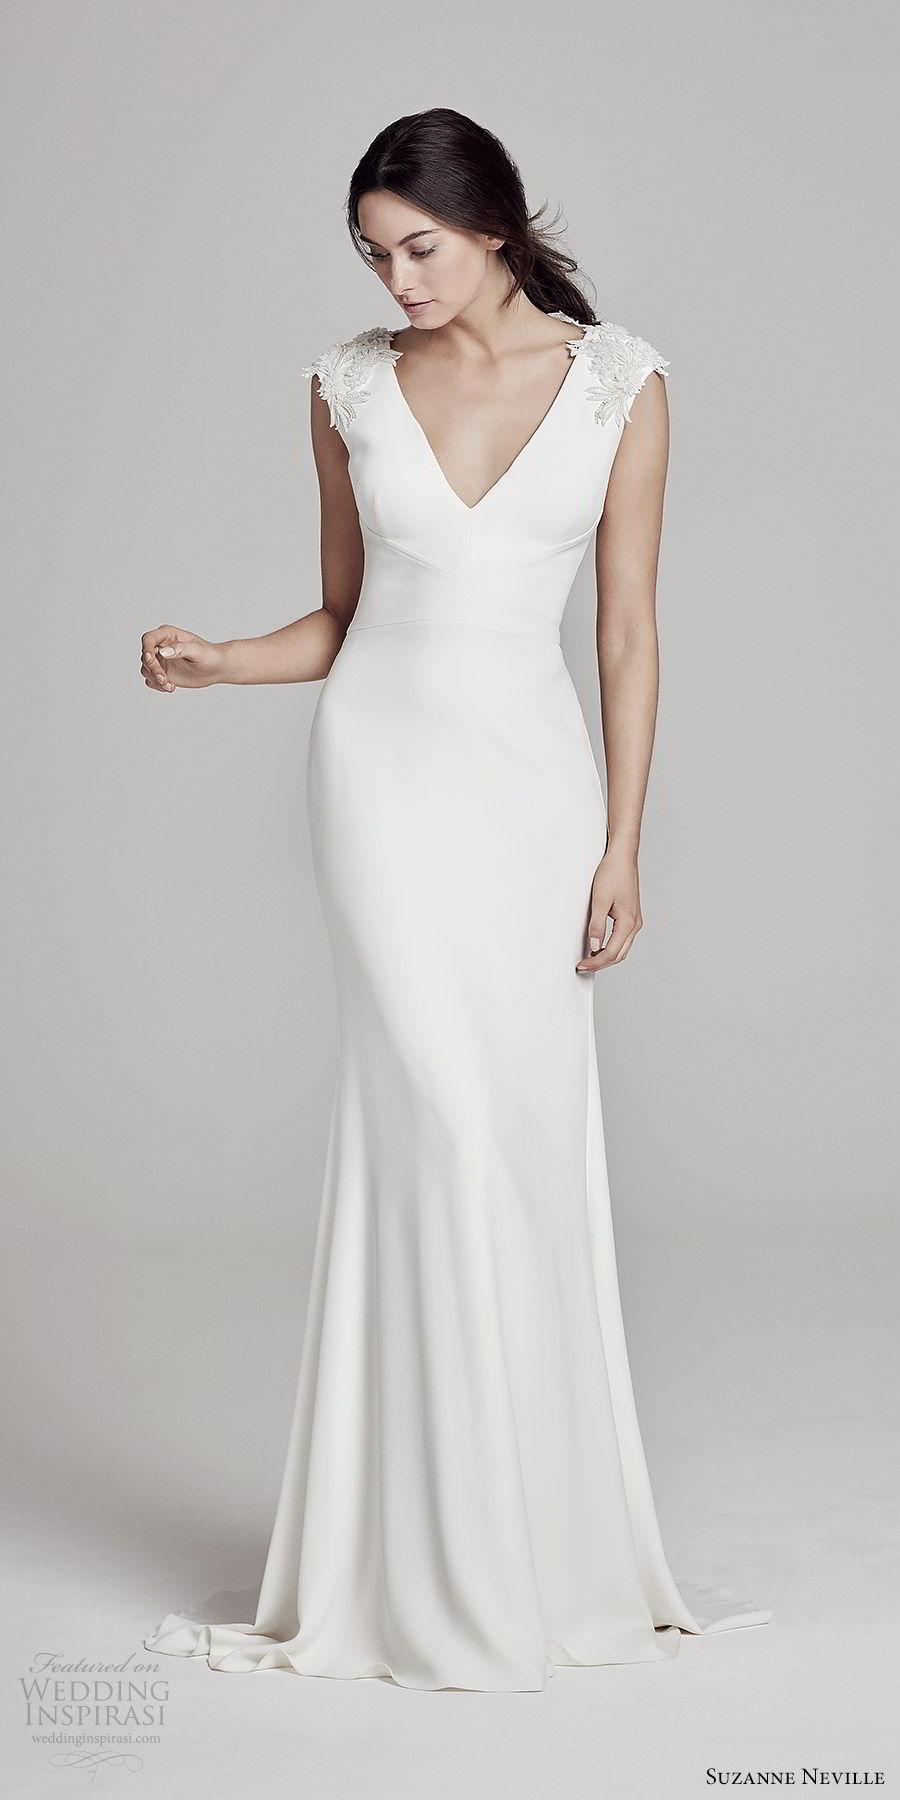 suzanne neville bridal 2019 embellished cap sleeves v neck sheath wedding dress (austen) chic minimal mv